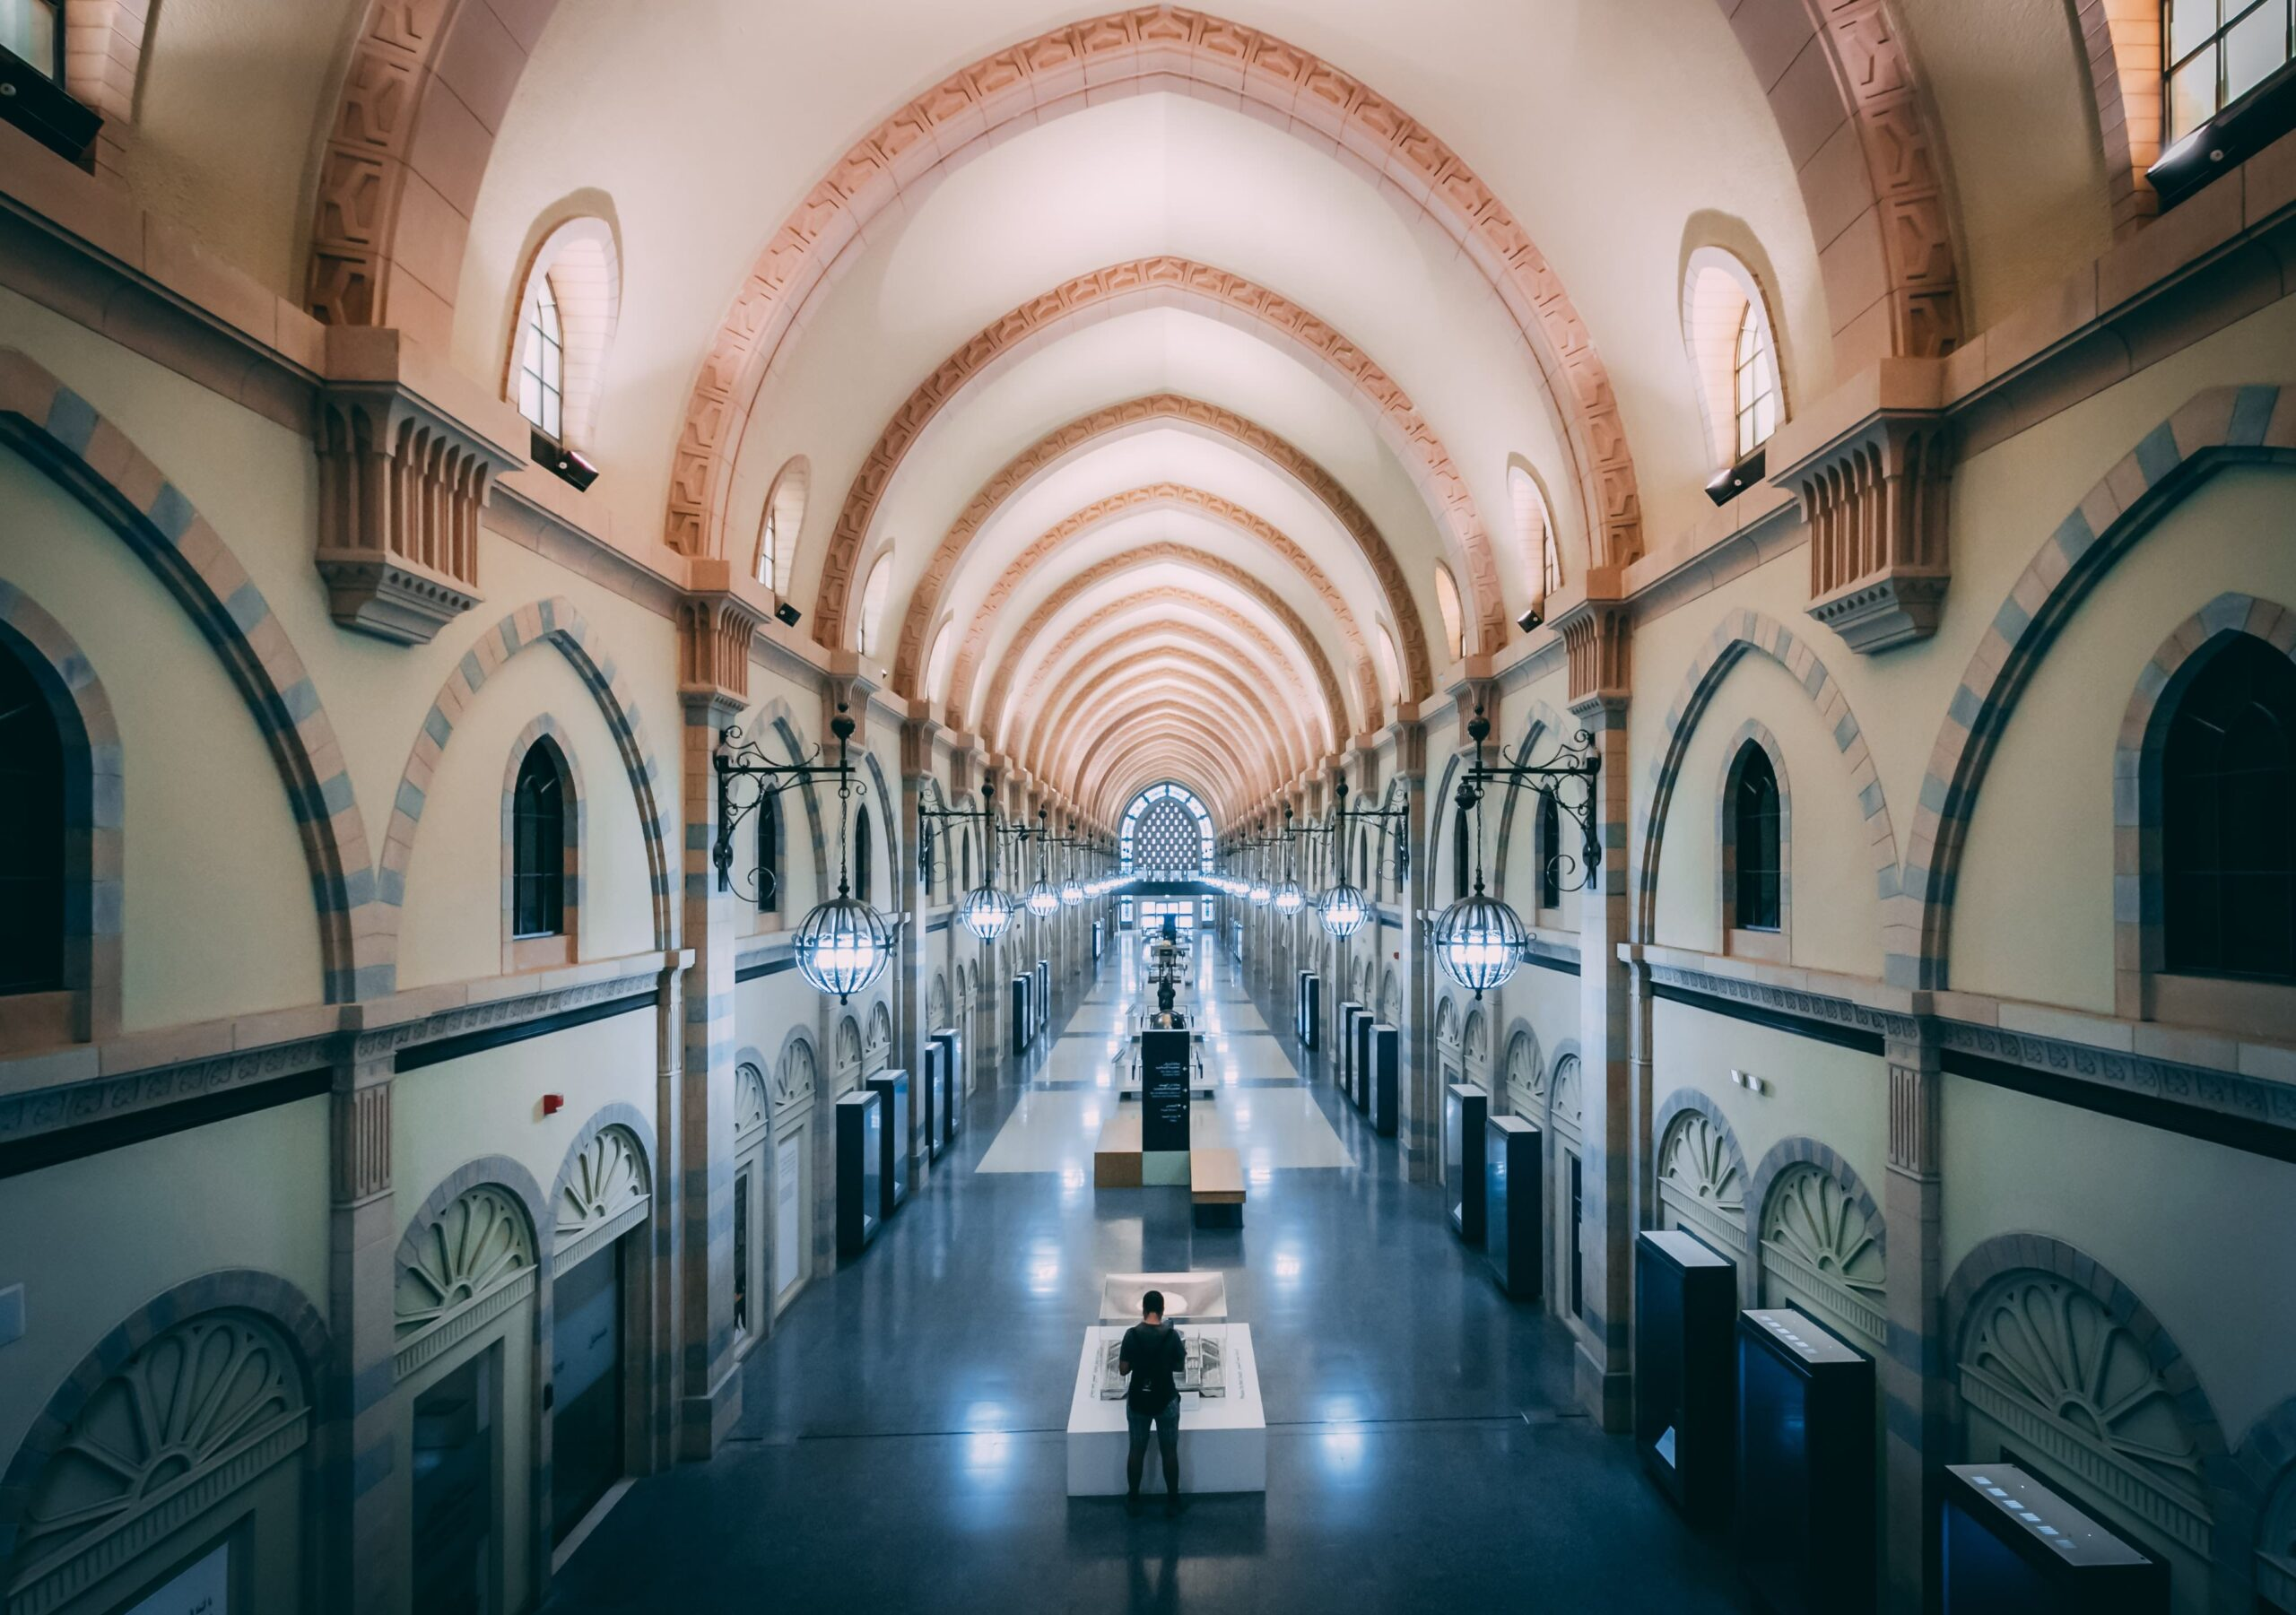 Interiors of sharjah souq